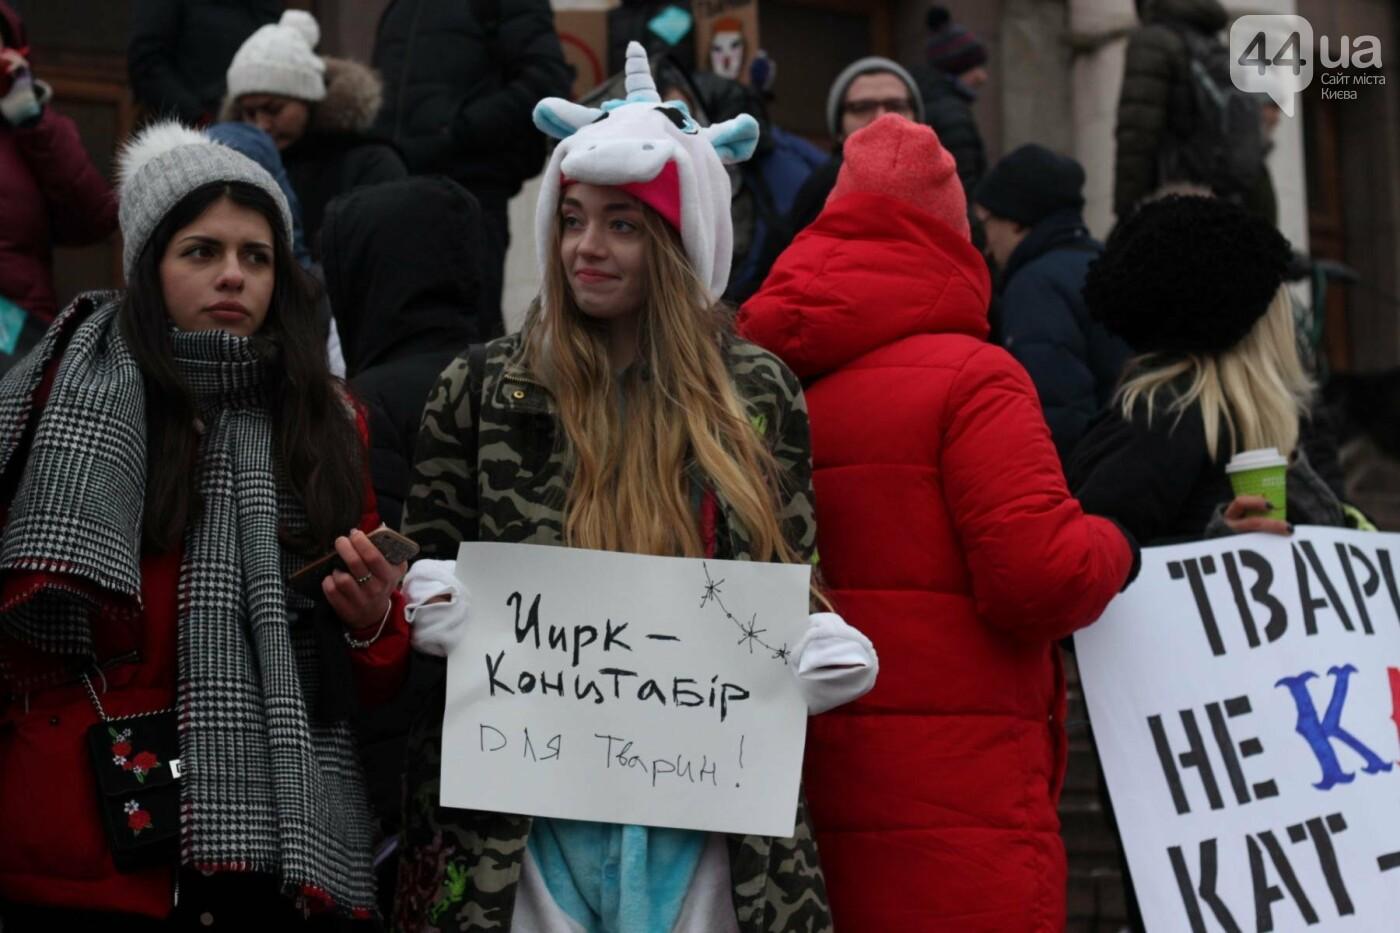 Цирк без животных: как в Киеве прошла акция протеста, фото-33